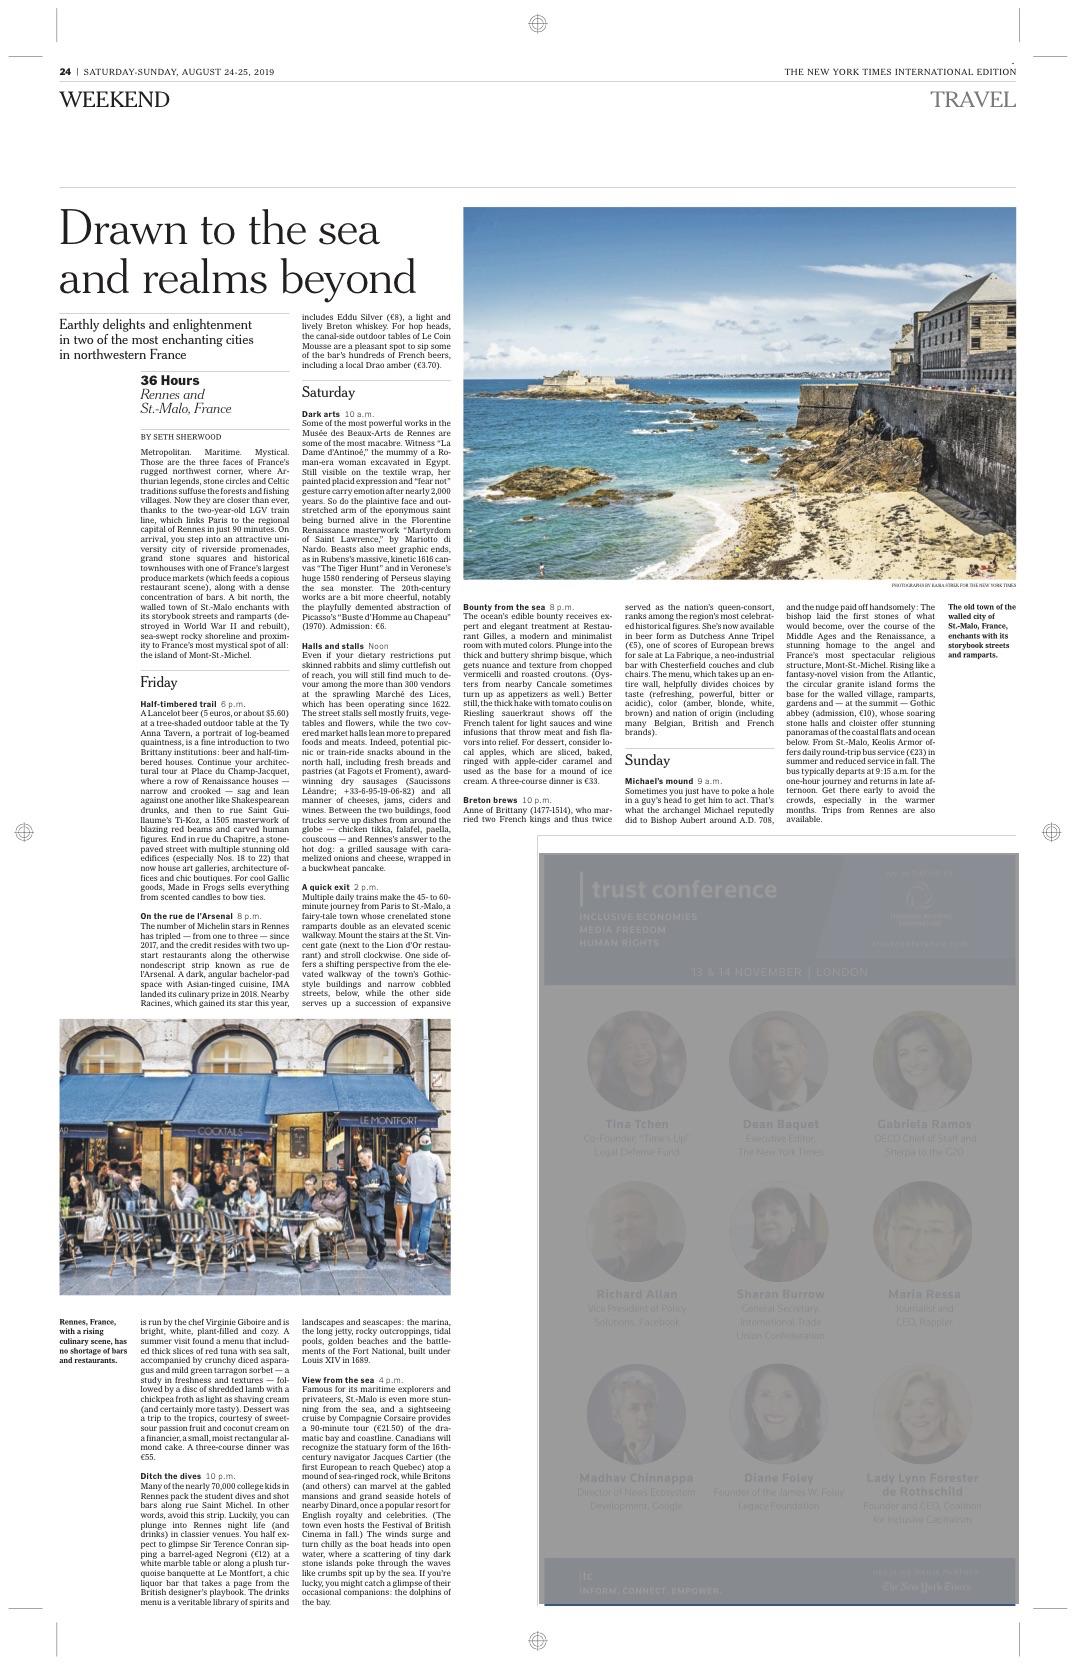 The New York Times International / Kasia Strek